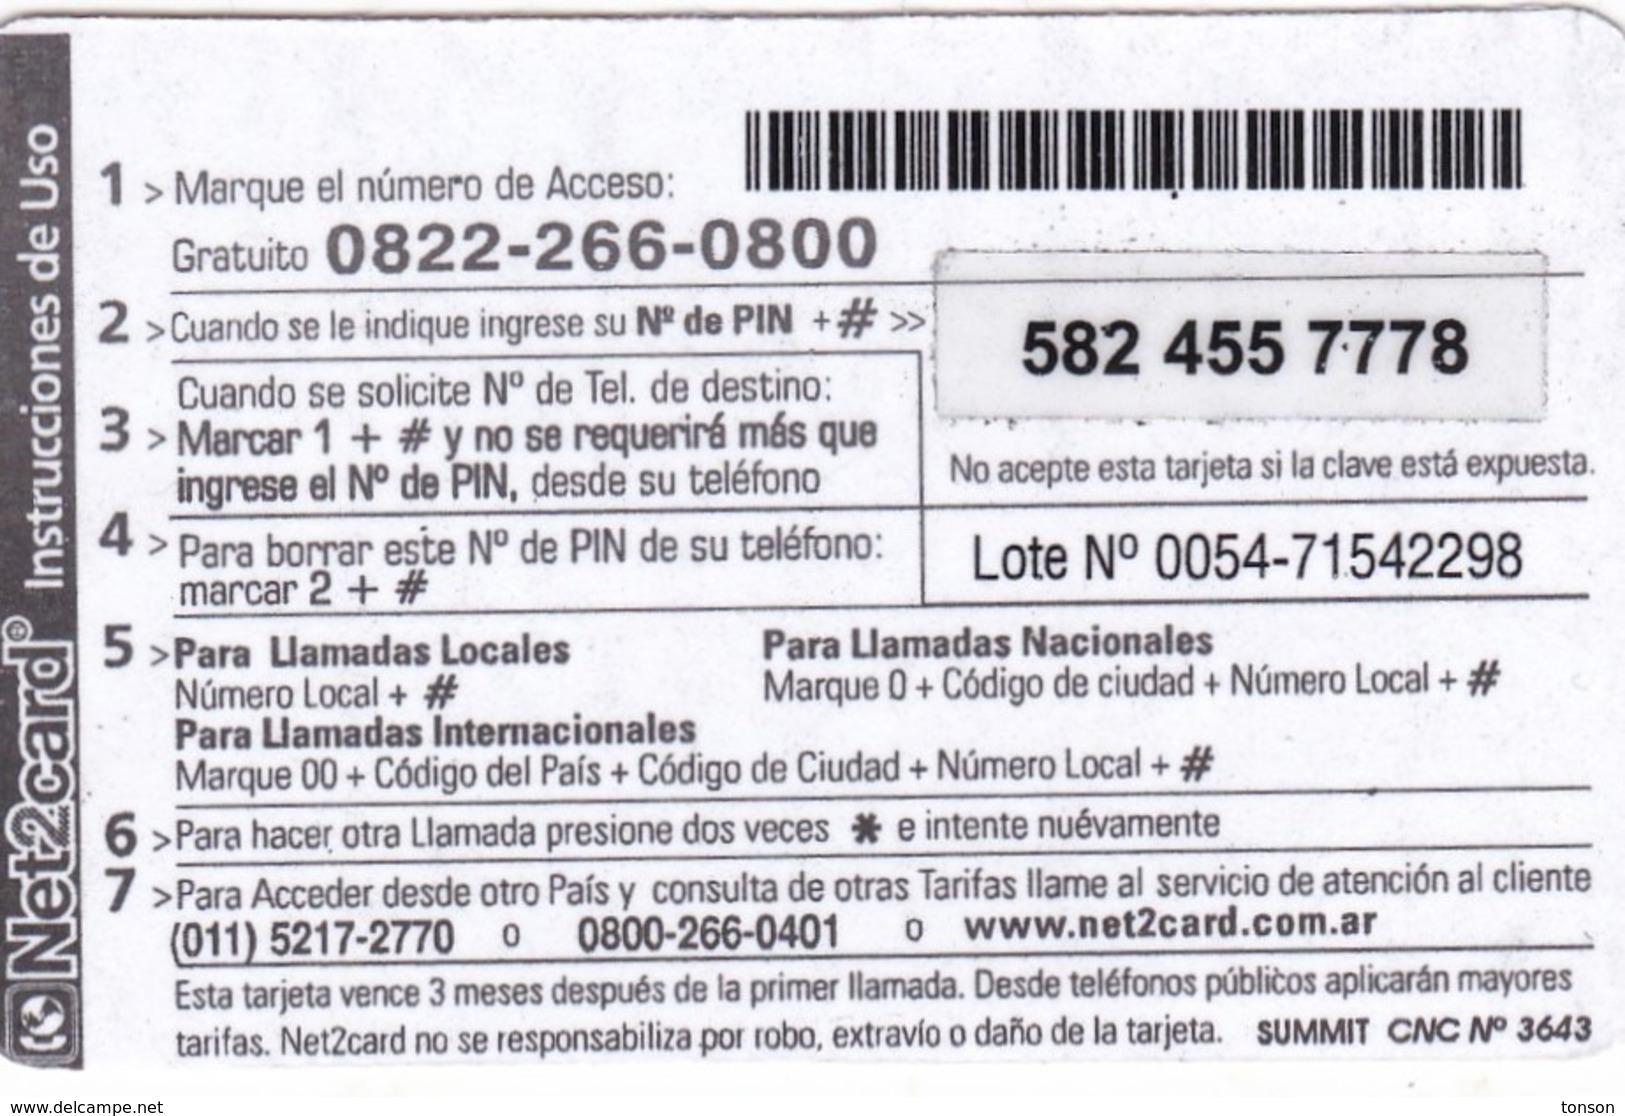 Argentina, AR-Pre-0278, Net2card, Premium $5, 2 Scans. - Argentina